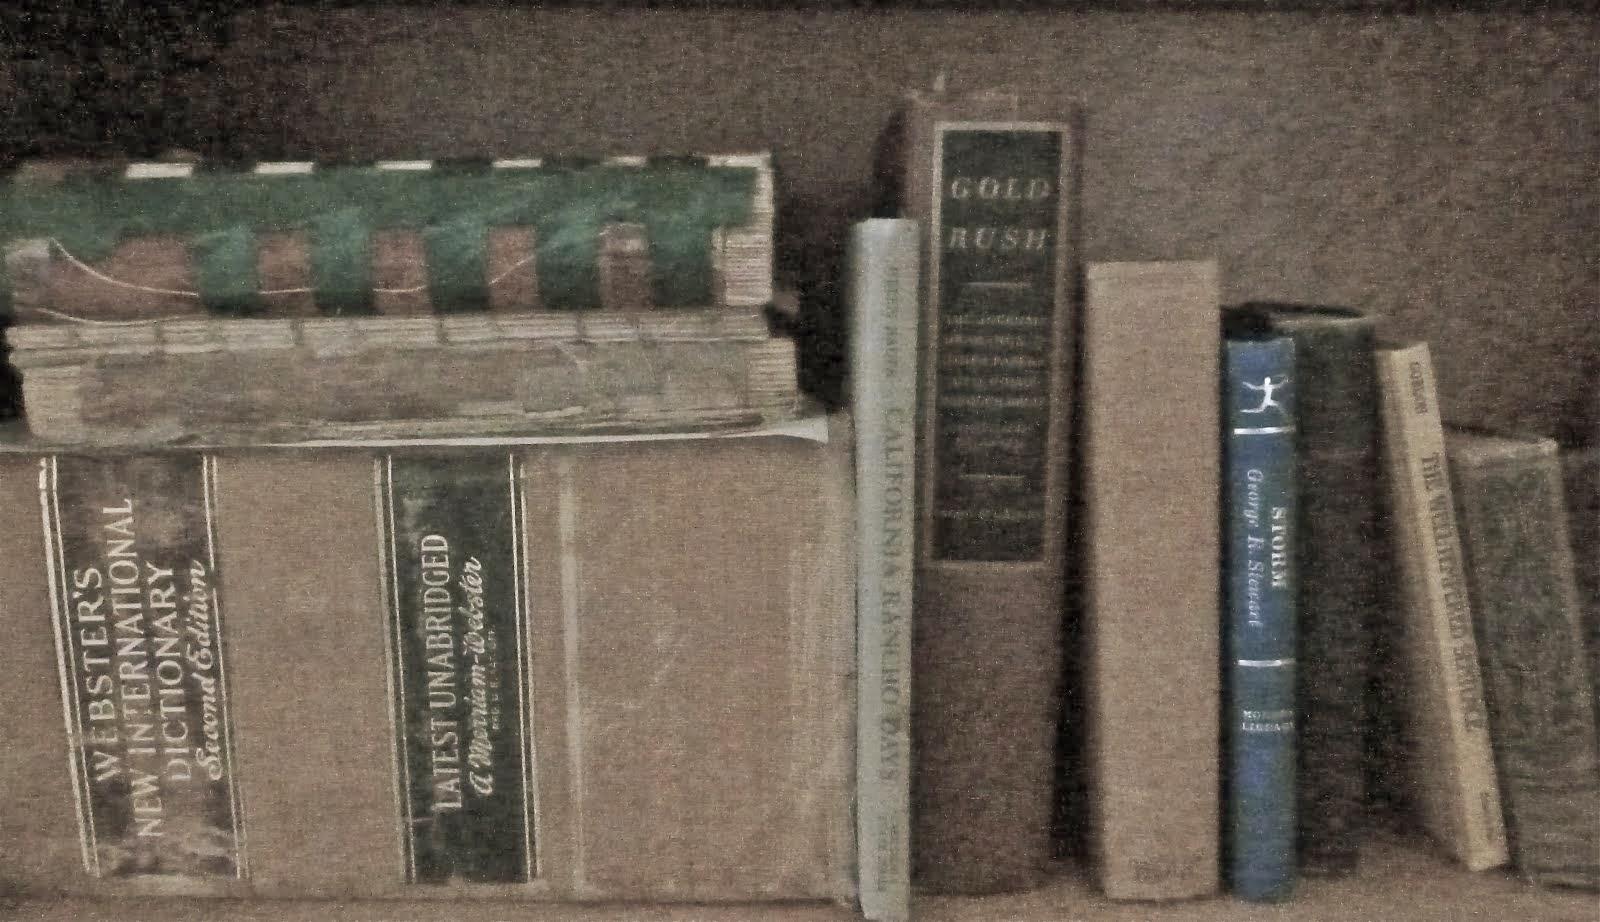 Bumpa's Bookshelf